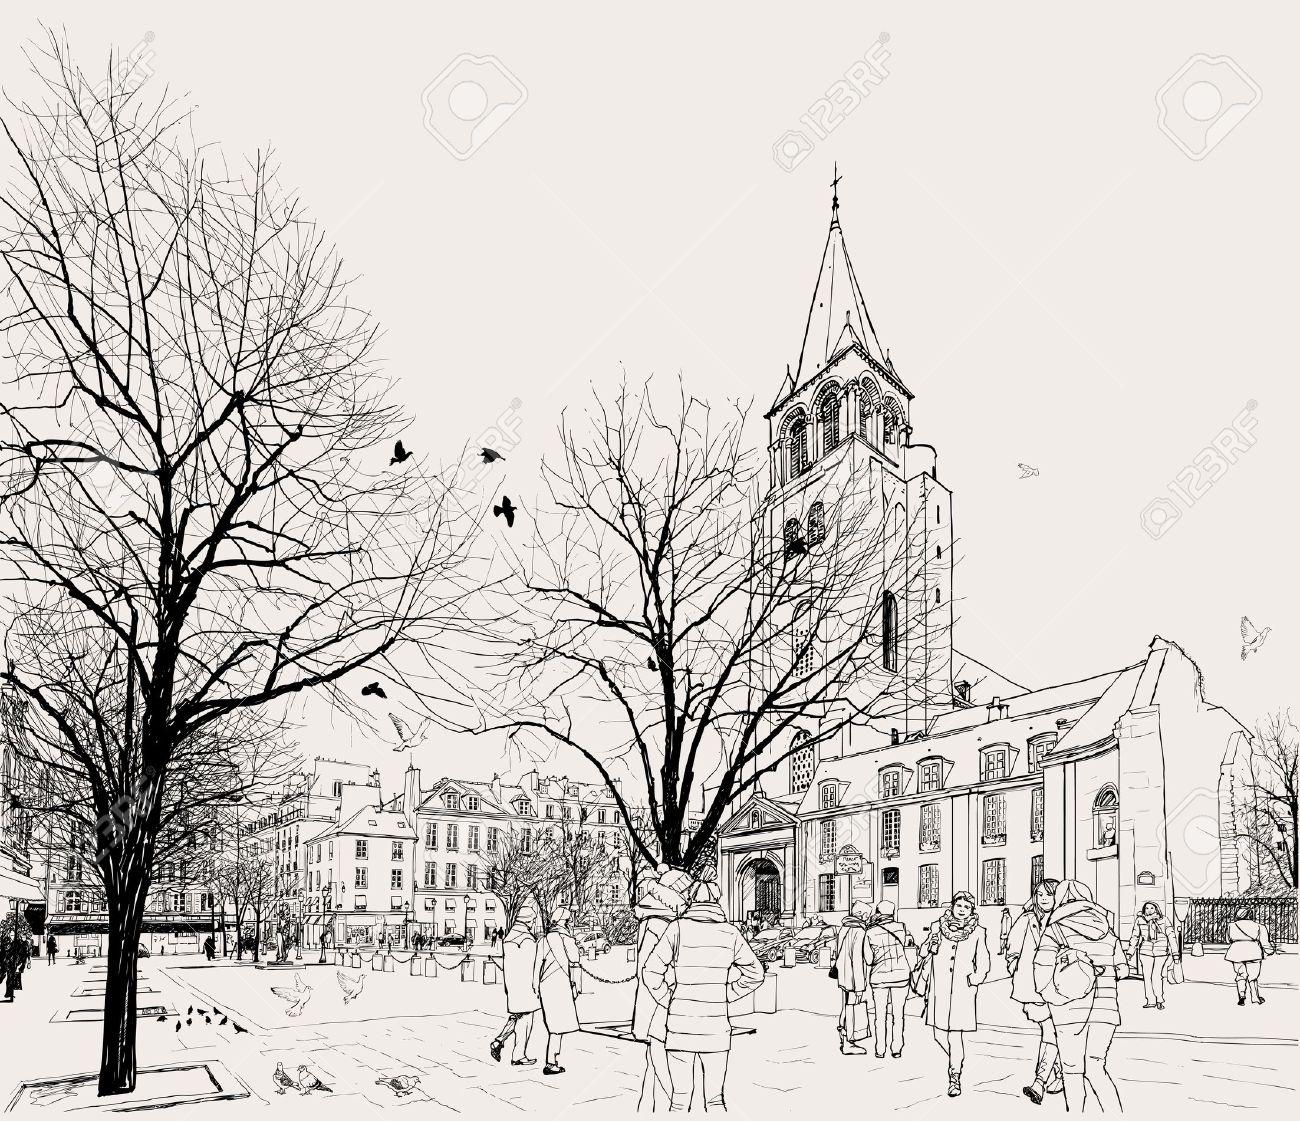 Vector illustration of St-Germain-des-Pres area in Paris Stock Vector - 11256945